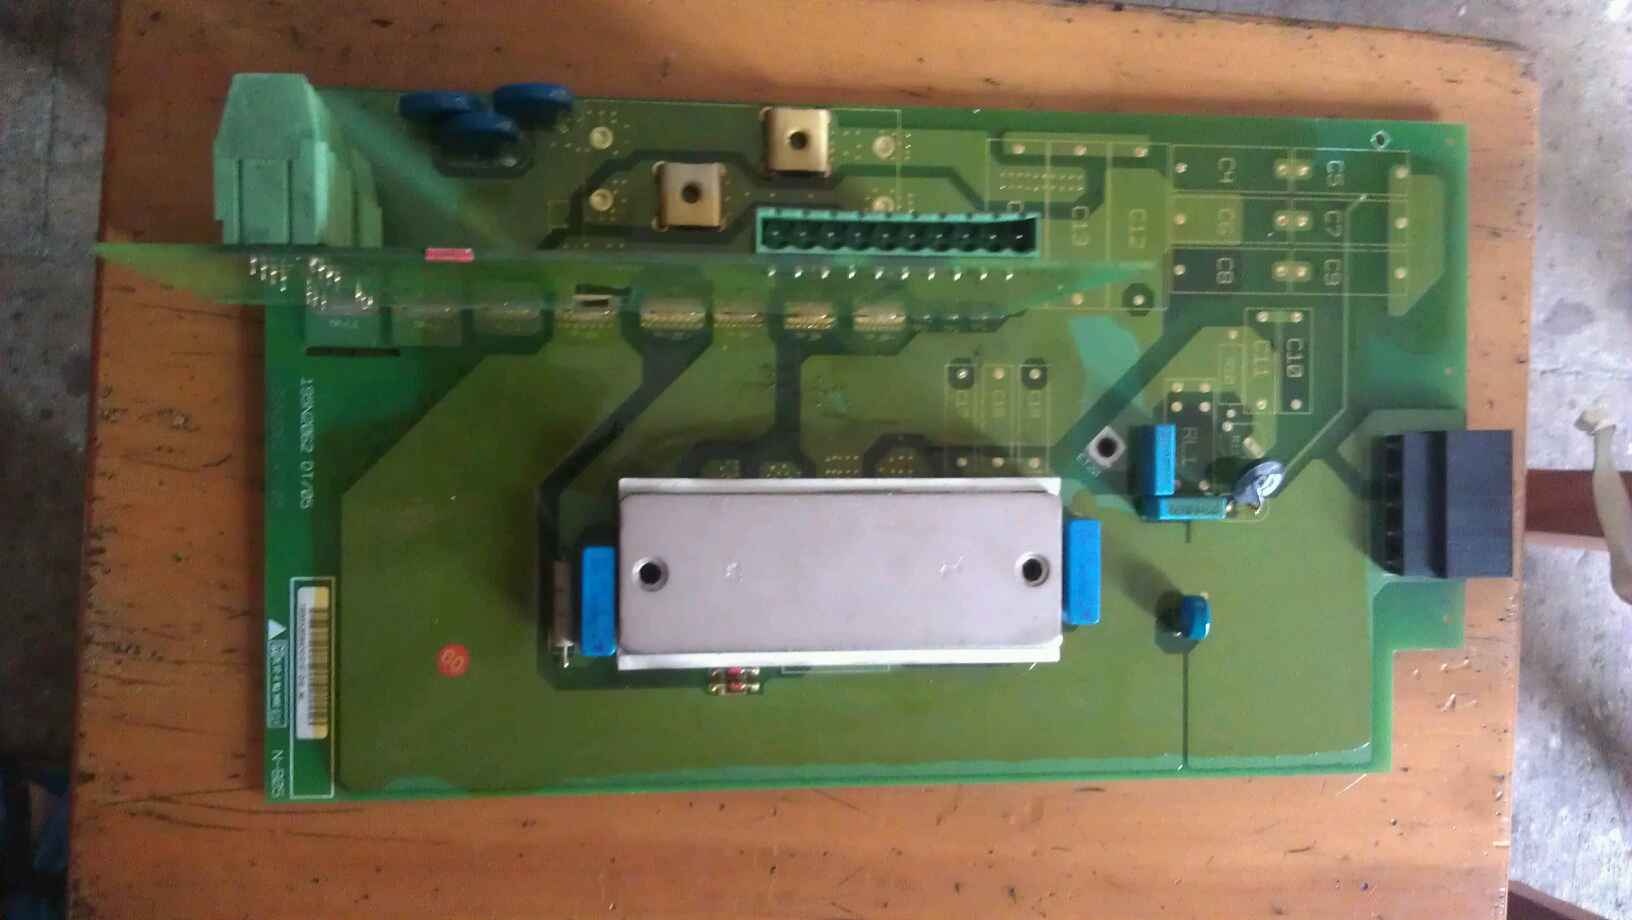 Danfoss frequency converter VLT2800 series, rectifier DDB6U104N16RR, 195N2062DT/05